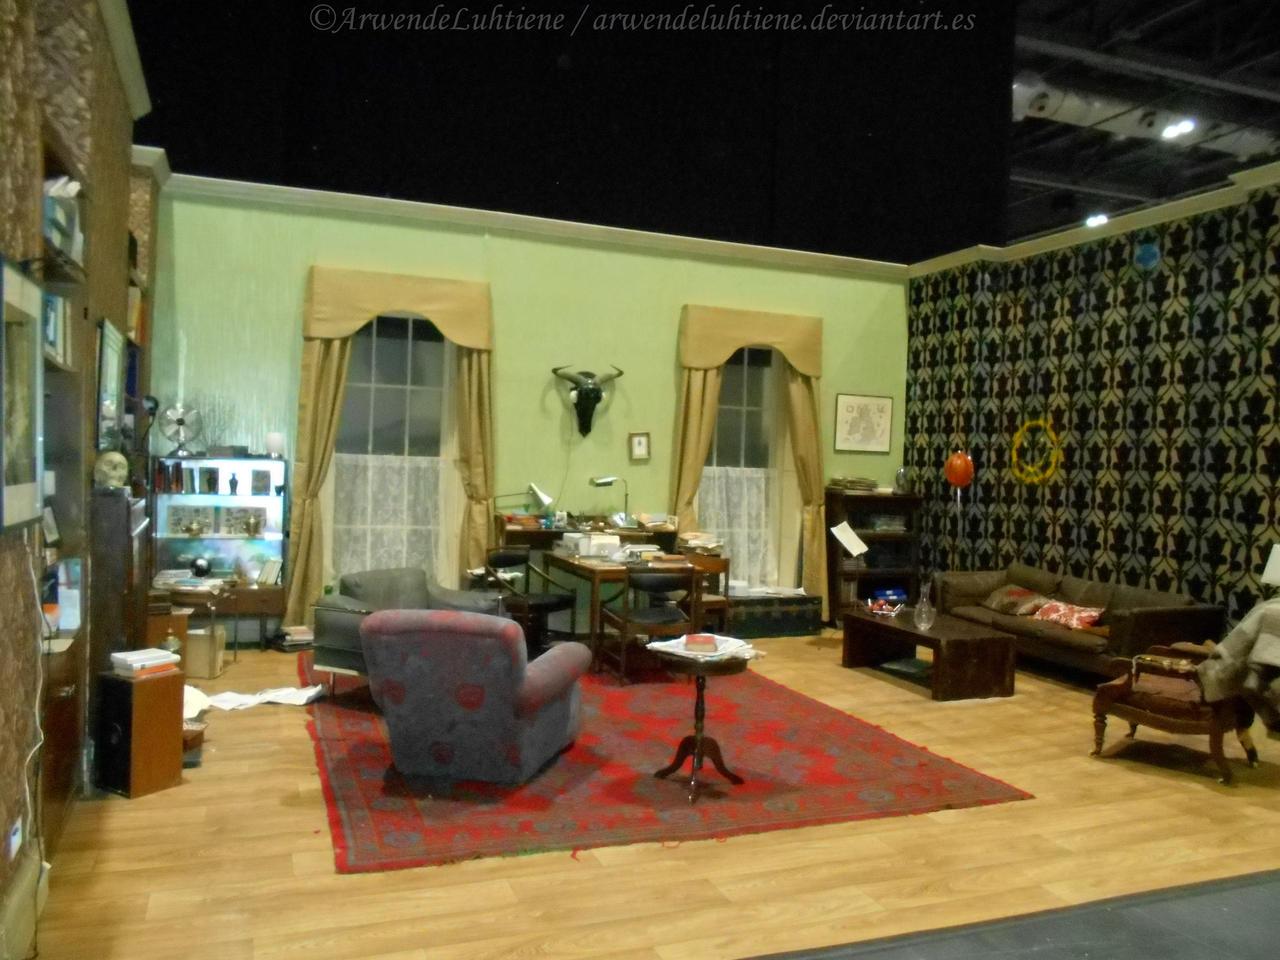 221b Living Room Set At Sherlocked By Arwendeluhtiene On